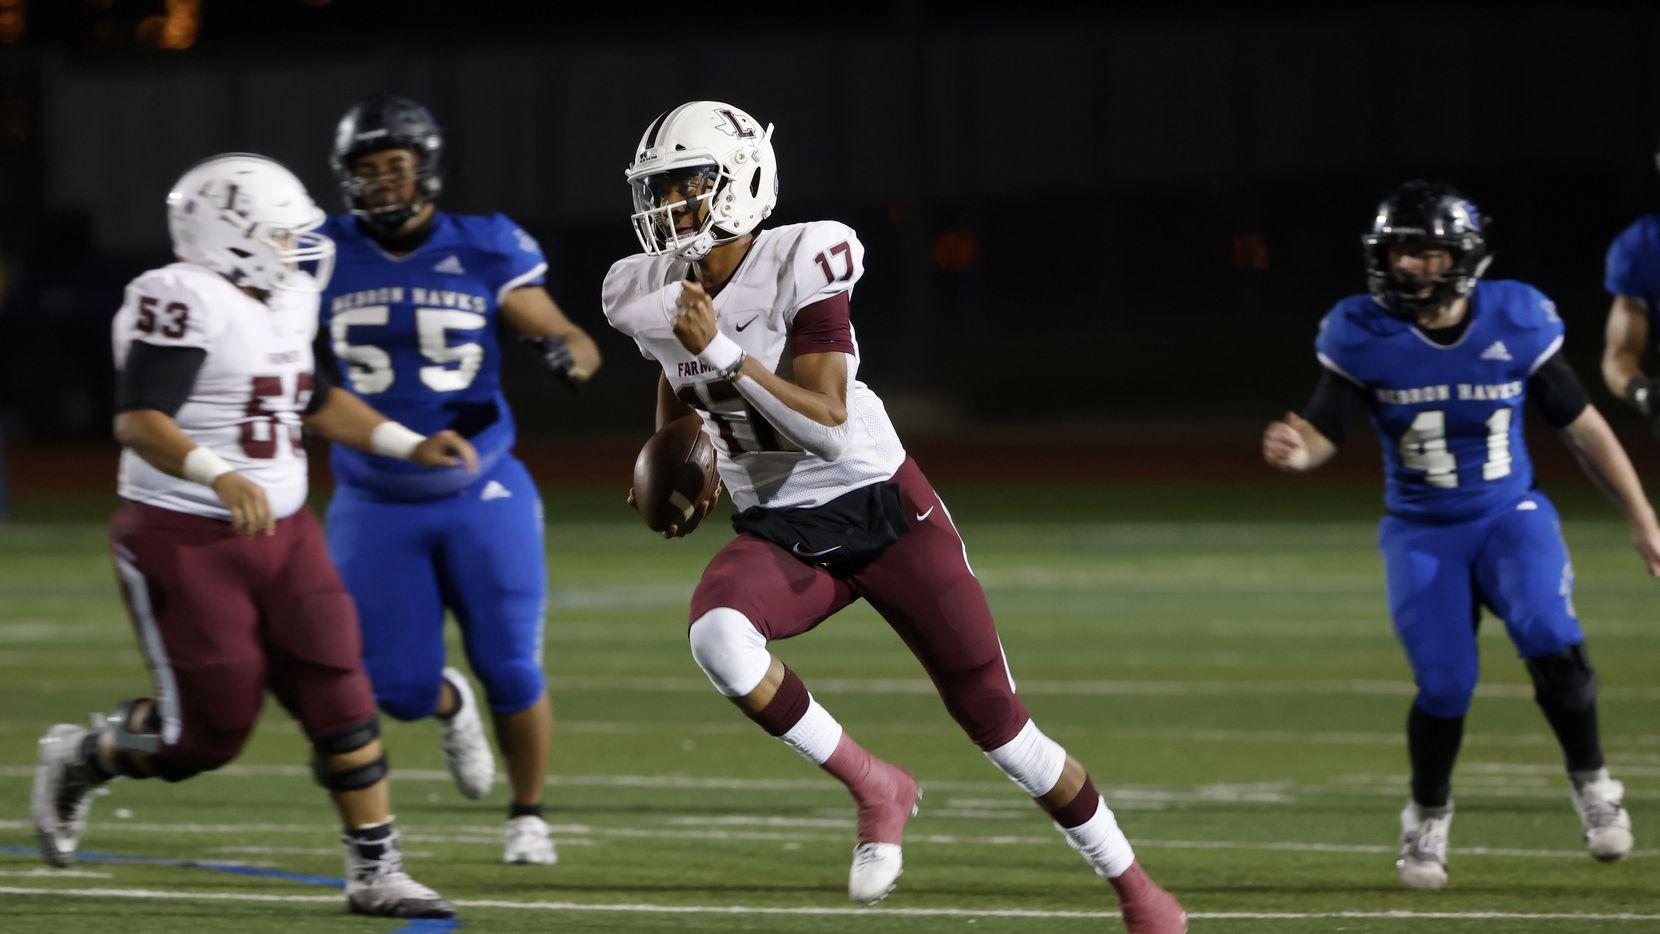 Lewisville quarterback Taylen Green (17) runs for a long touchdown against Hebron during their District 6-6A high school football game on Dec. 4, 2020.